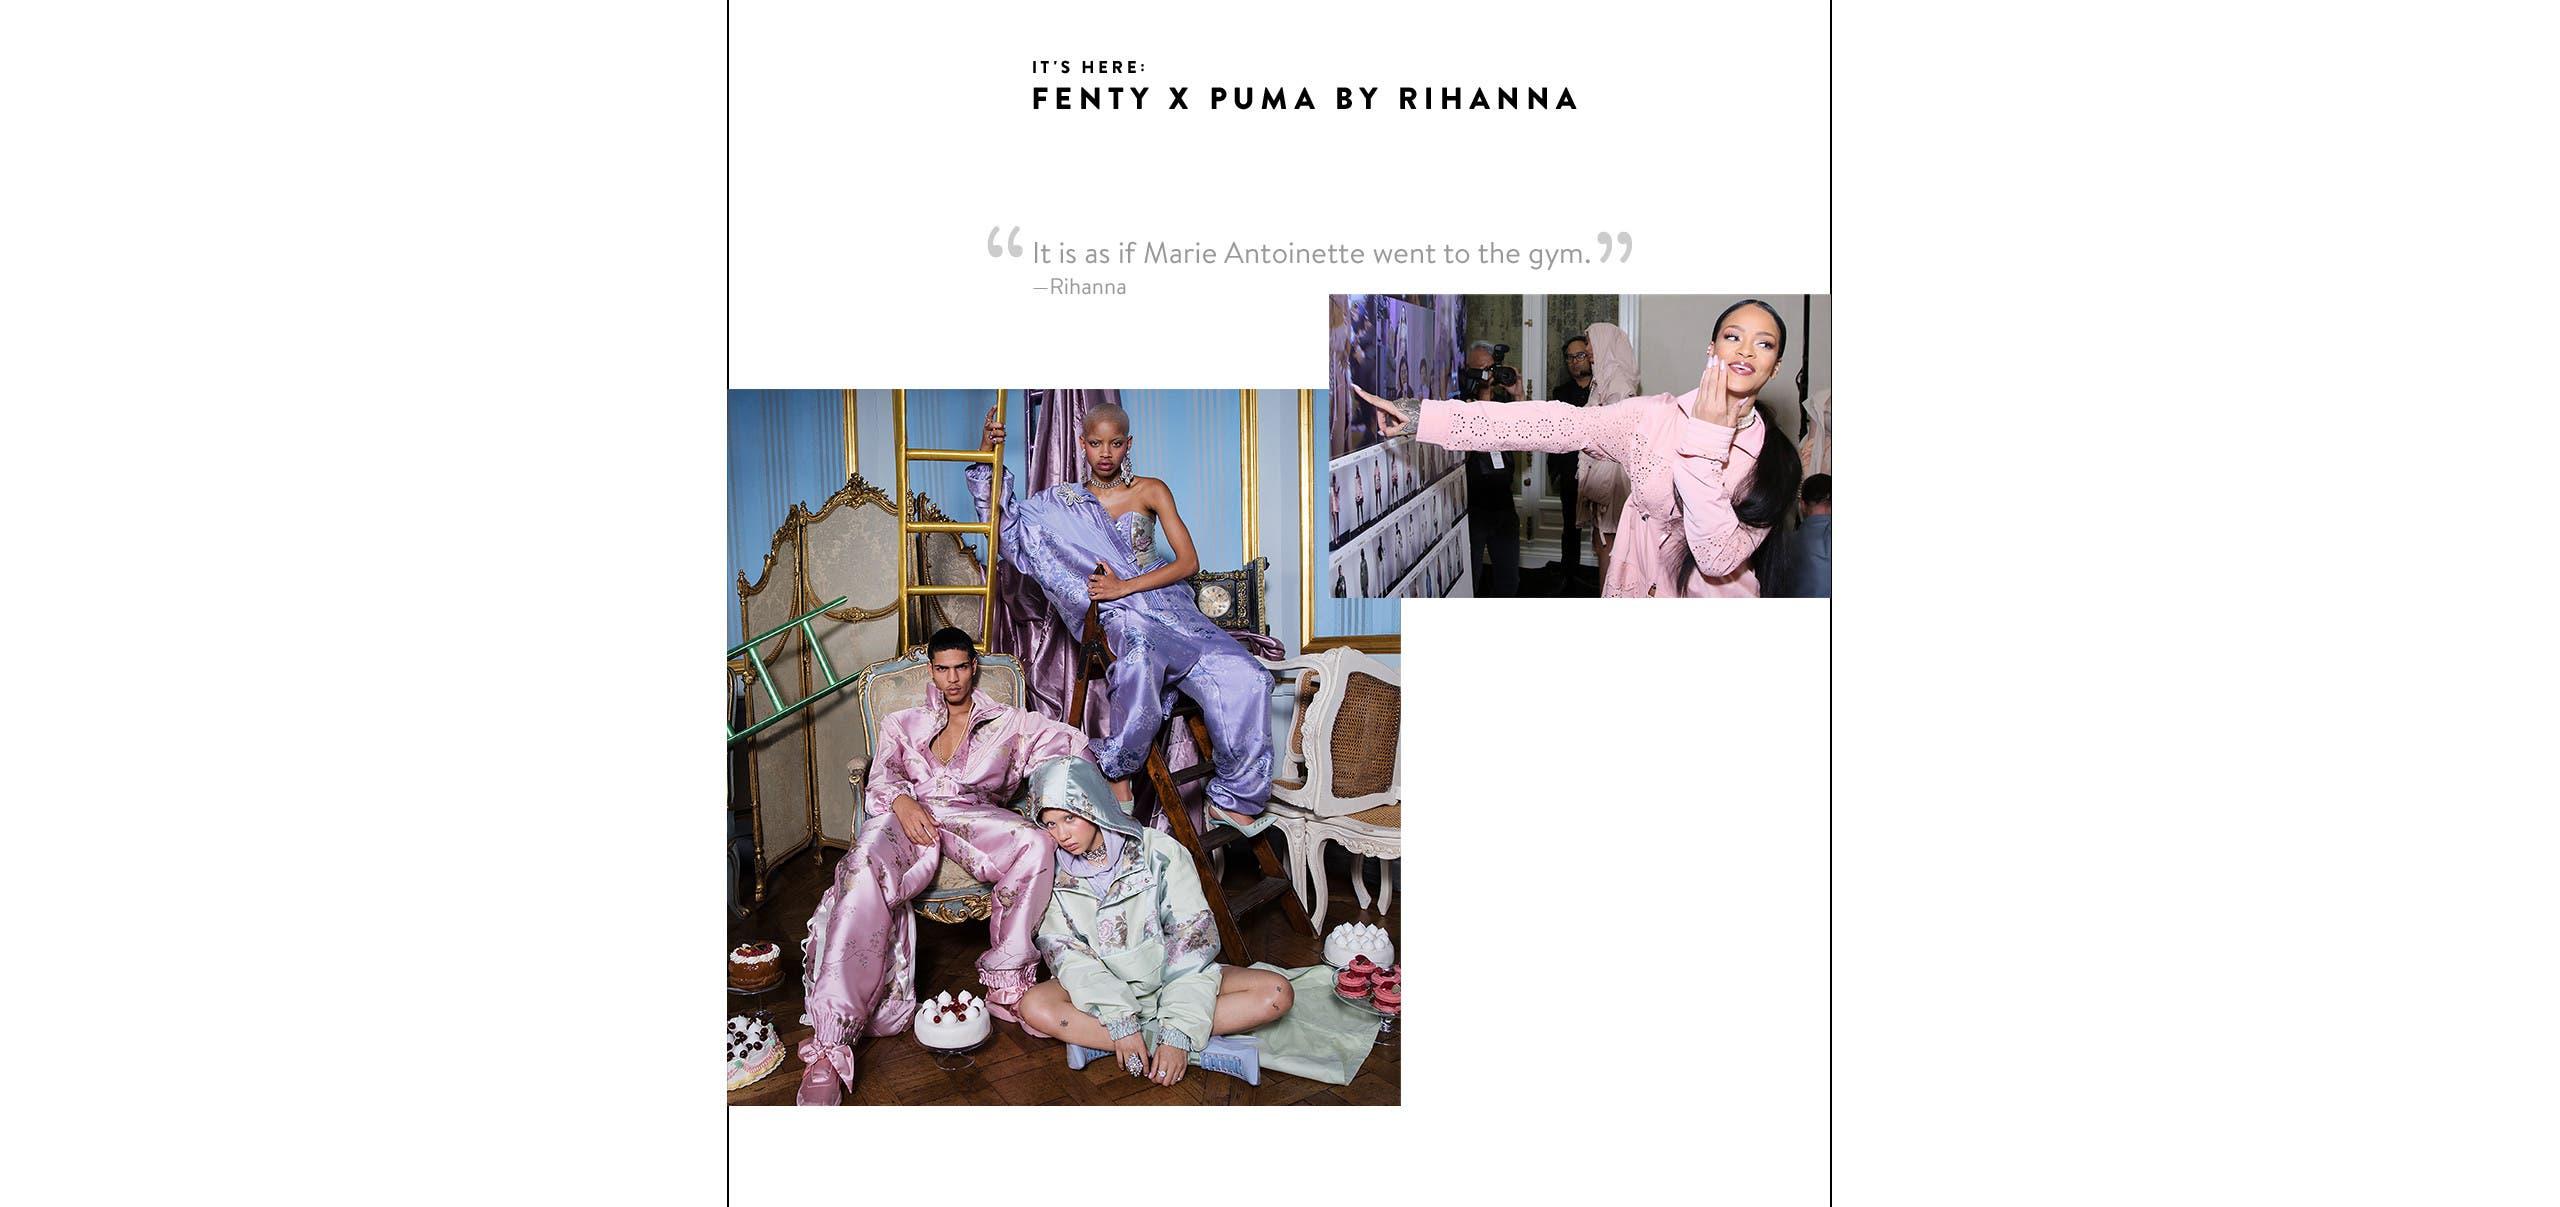 It's here: Fenty x Puma by Rihanna, spring 2017.